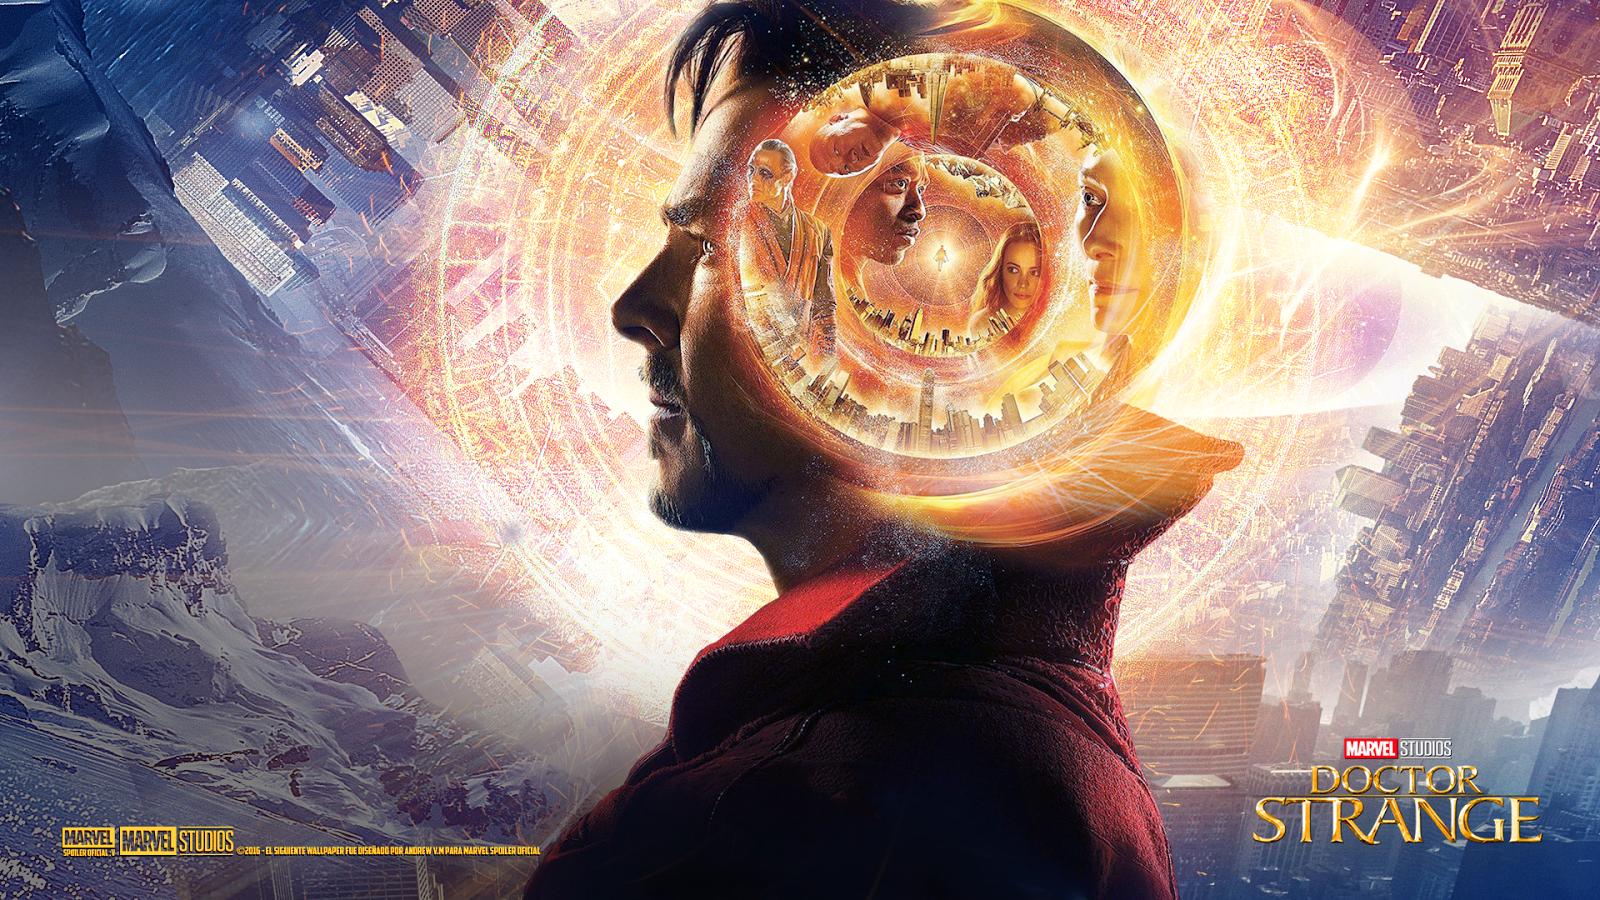 Marvel Spoiler Oficial Nuevo Wallpaper De Doctor Strange